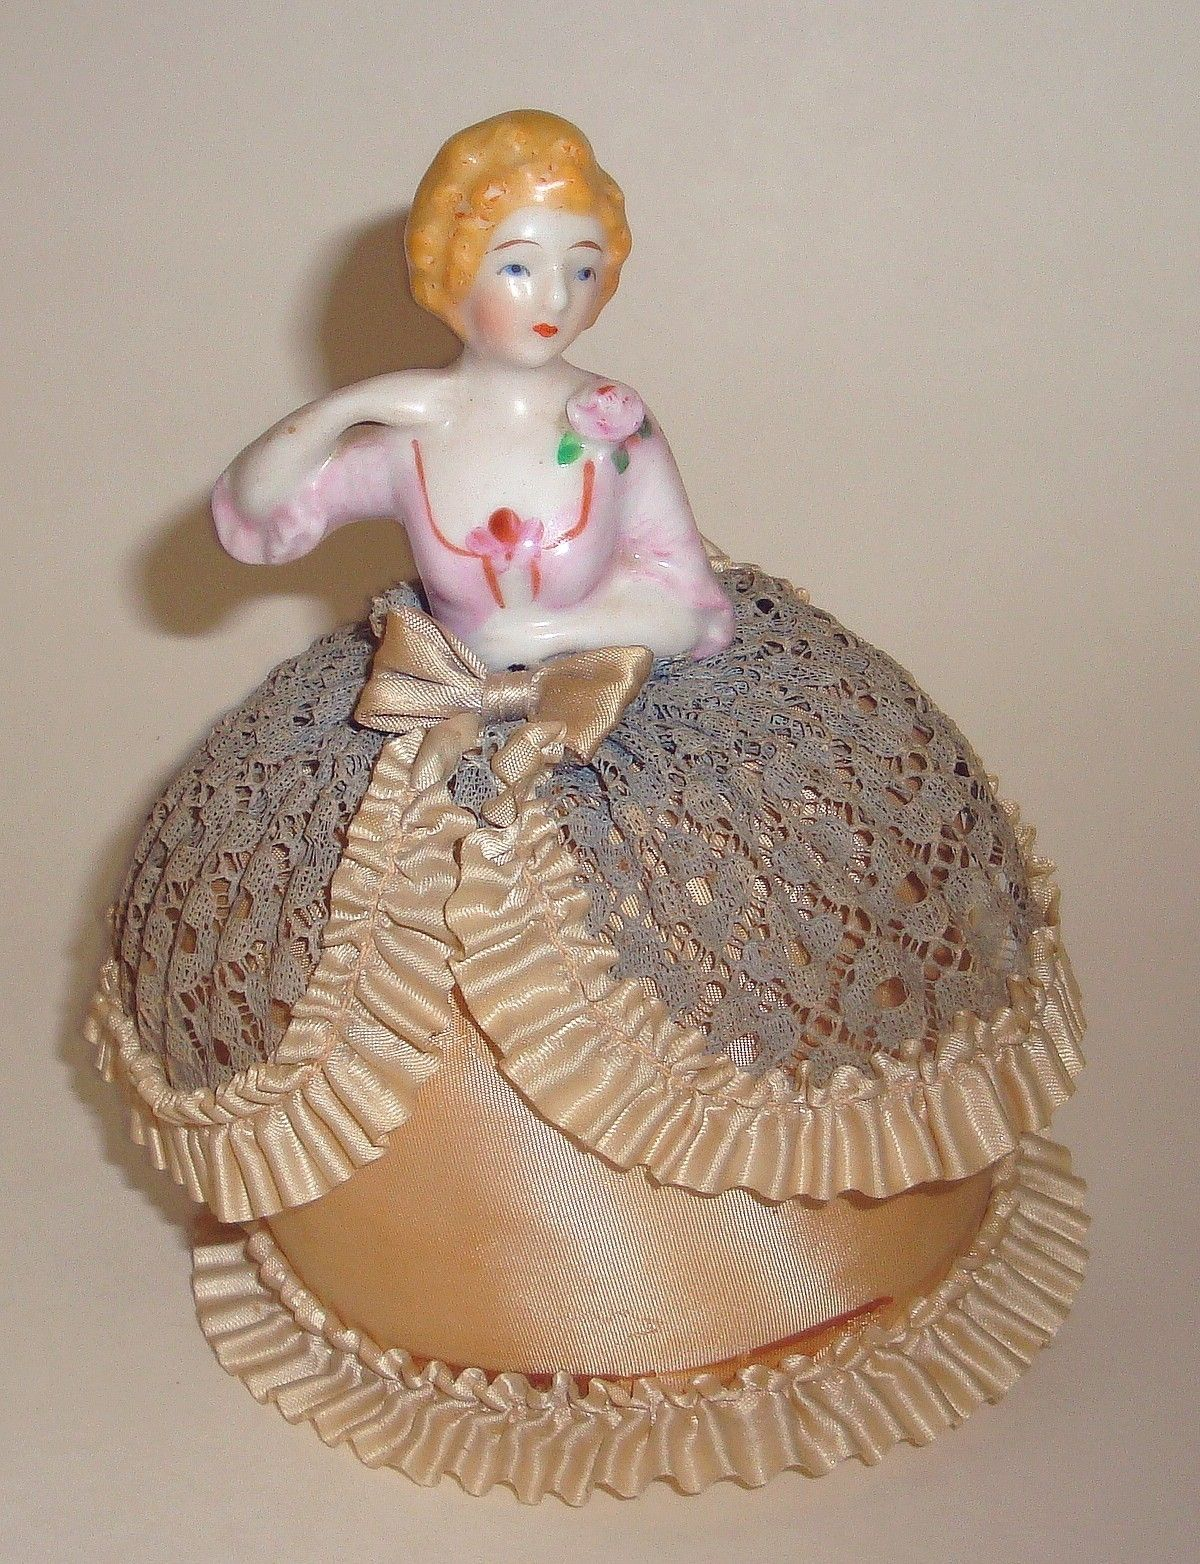 Vintage Doll PIN Cushion Fancy PIN Cushion Skirt With Porcelain Half Doll | eBay